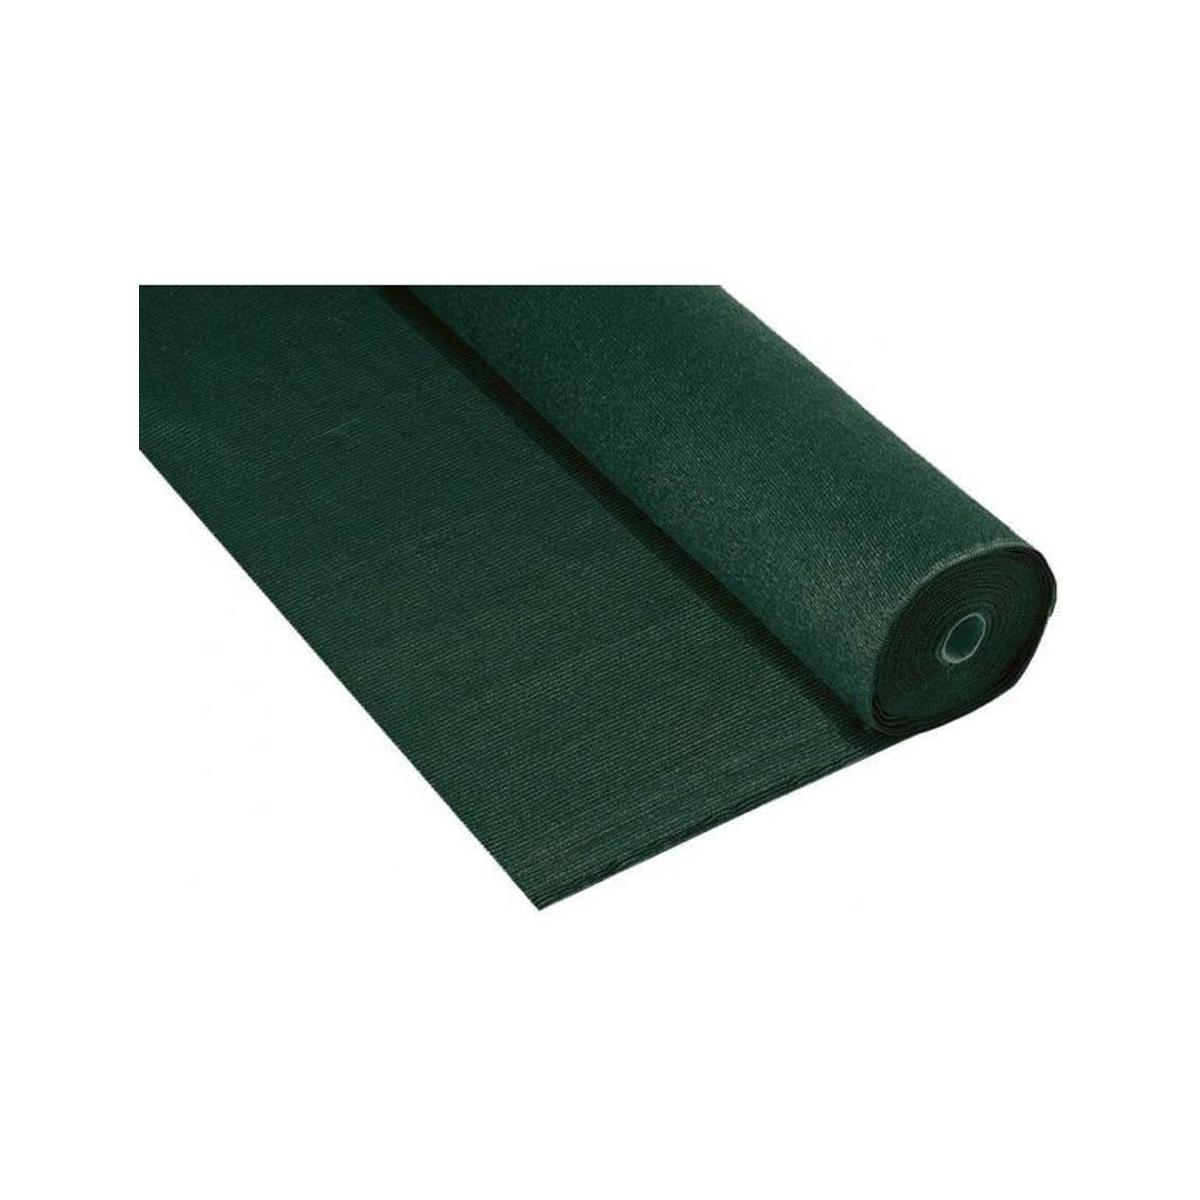 Brise vue en toile verte JET7GARDEN - Vert - 1 m 20 x 10 m